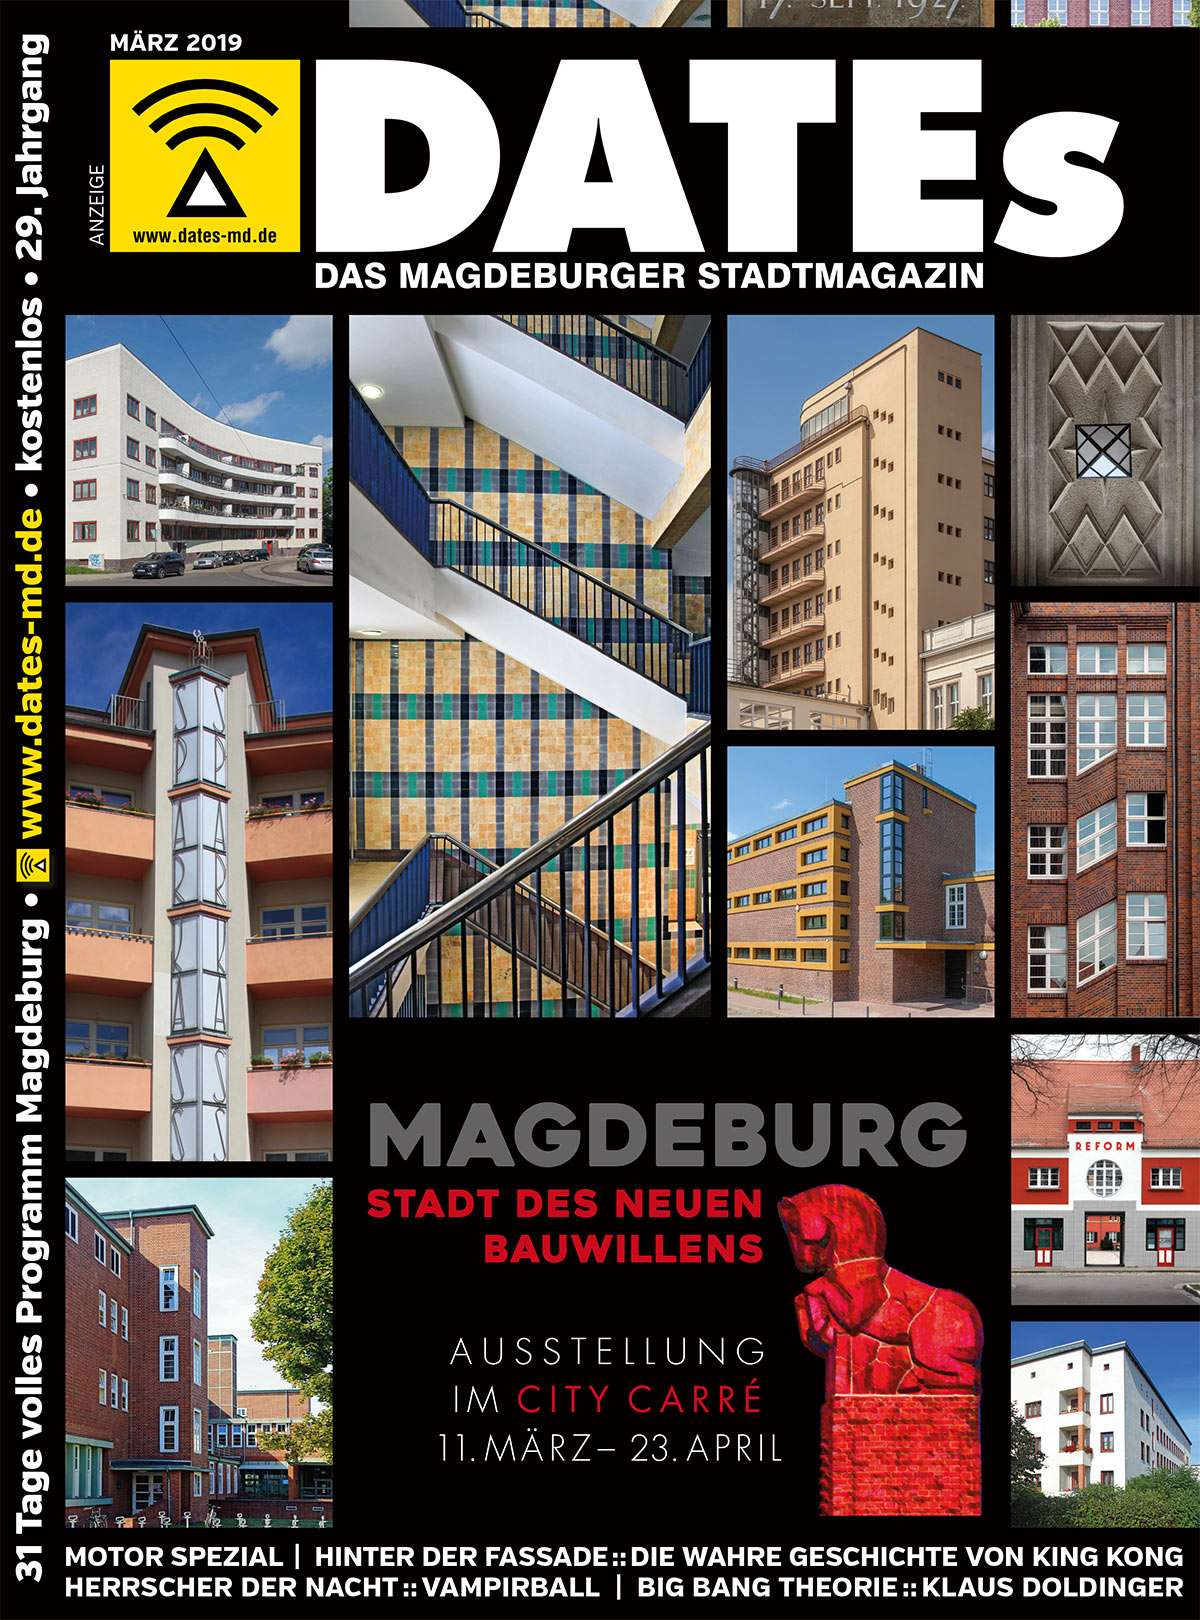 32f7044ac6df28 DATEs März 2019 - Magdeburger Moderne - Stadtmagazin DATEs